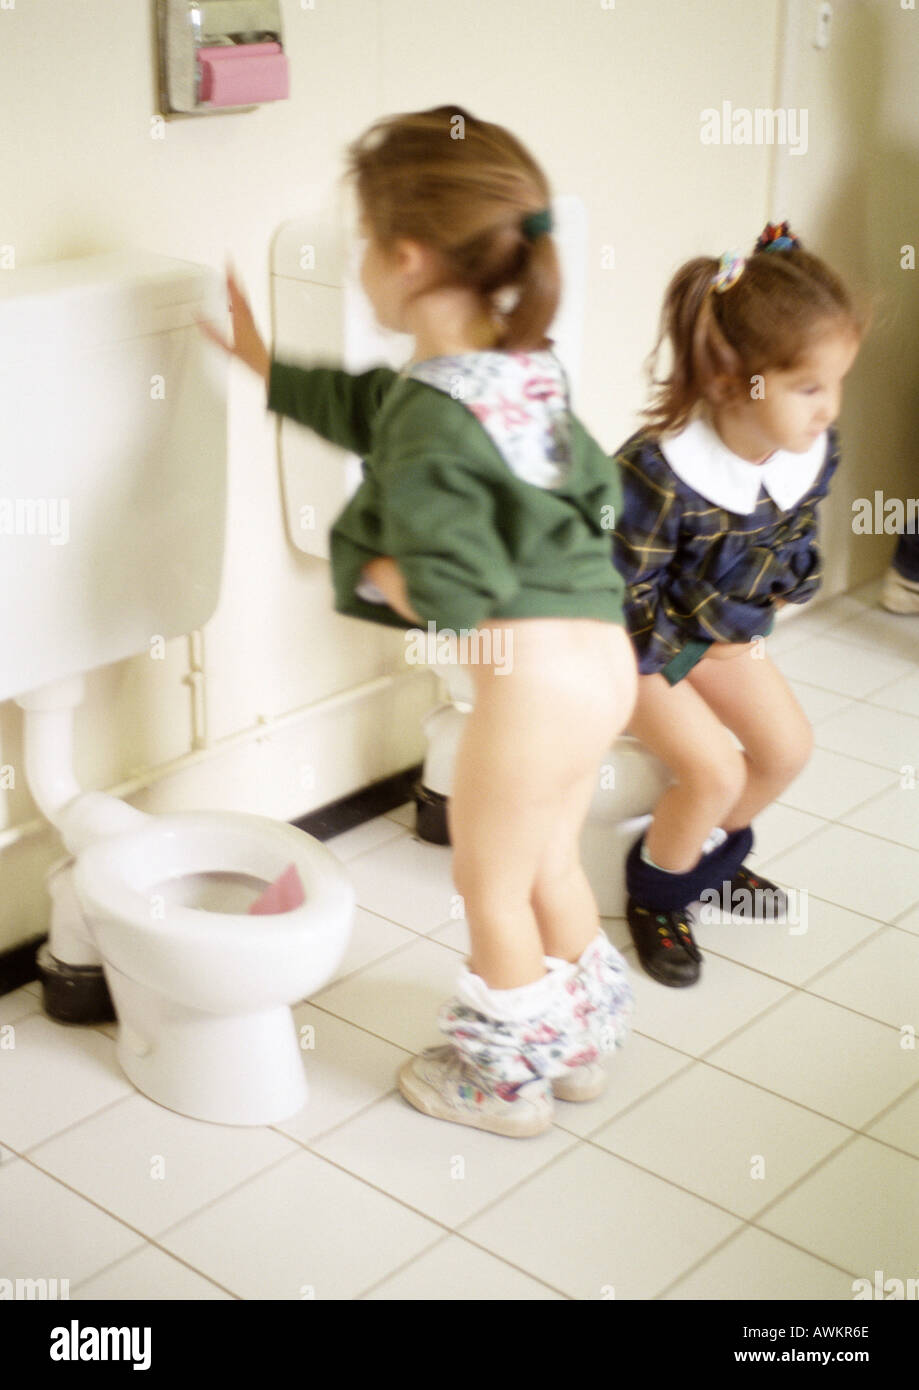 boy nude in a toilet